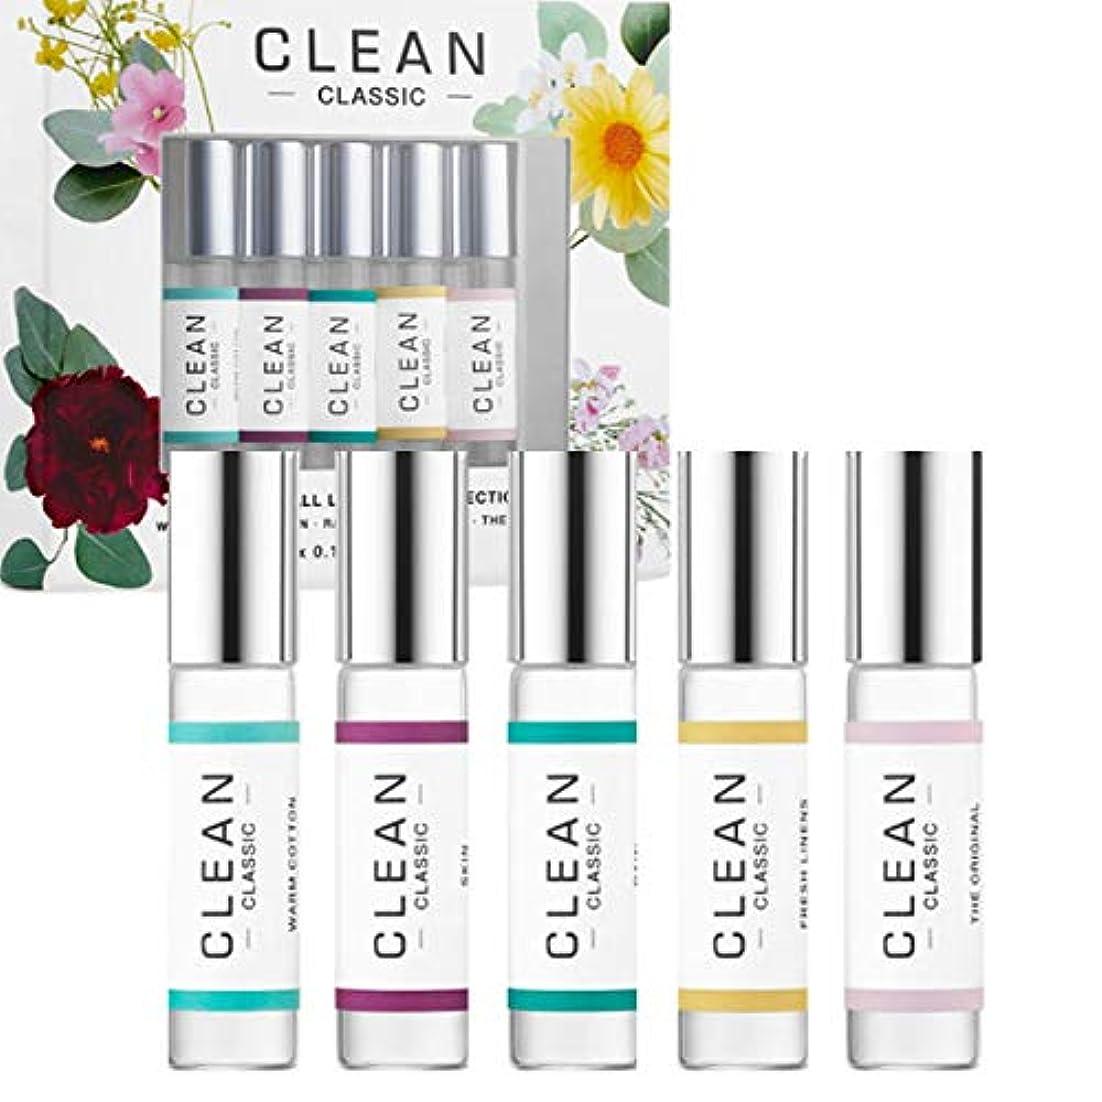 CLEAN(クリーン), Clean Classic Rollerball Set (5 x 0.17 oz/ 5 mL) [海外直送品] [並行輸入品]